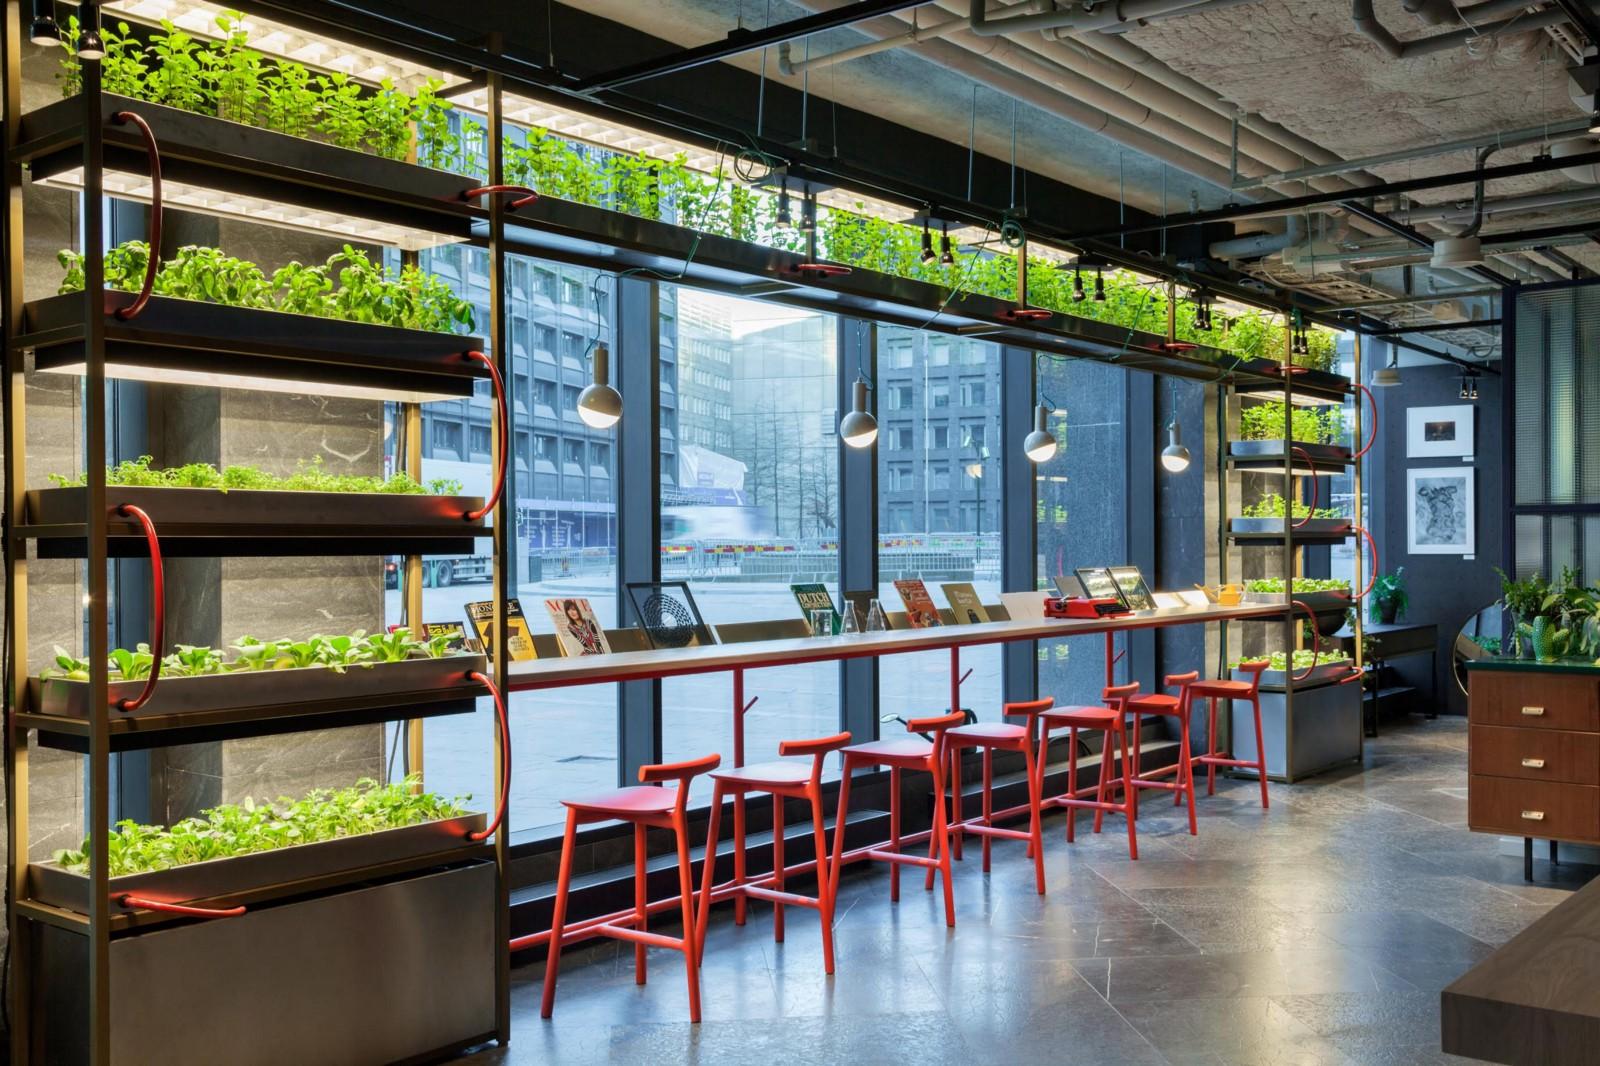 hobo-hotel-urban-farming-initiative